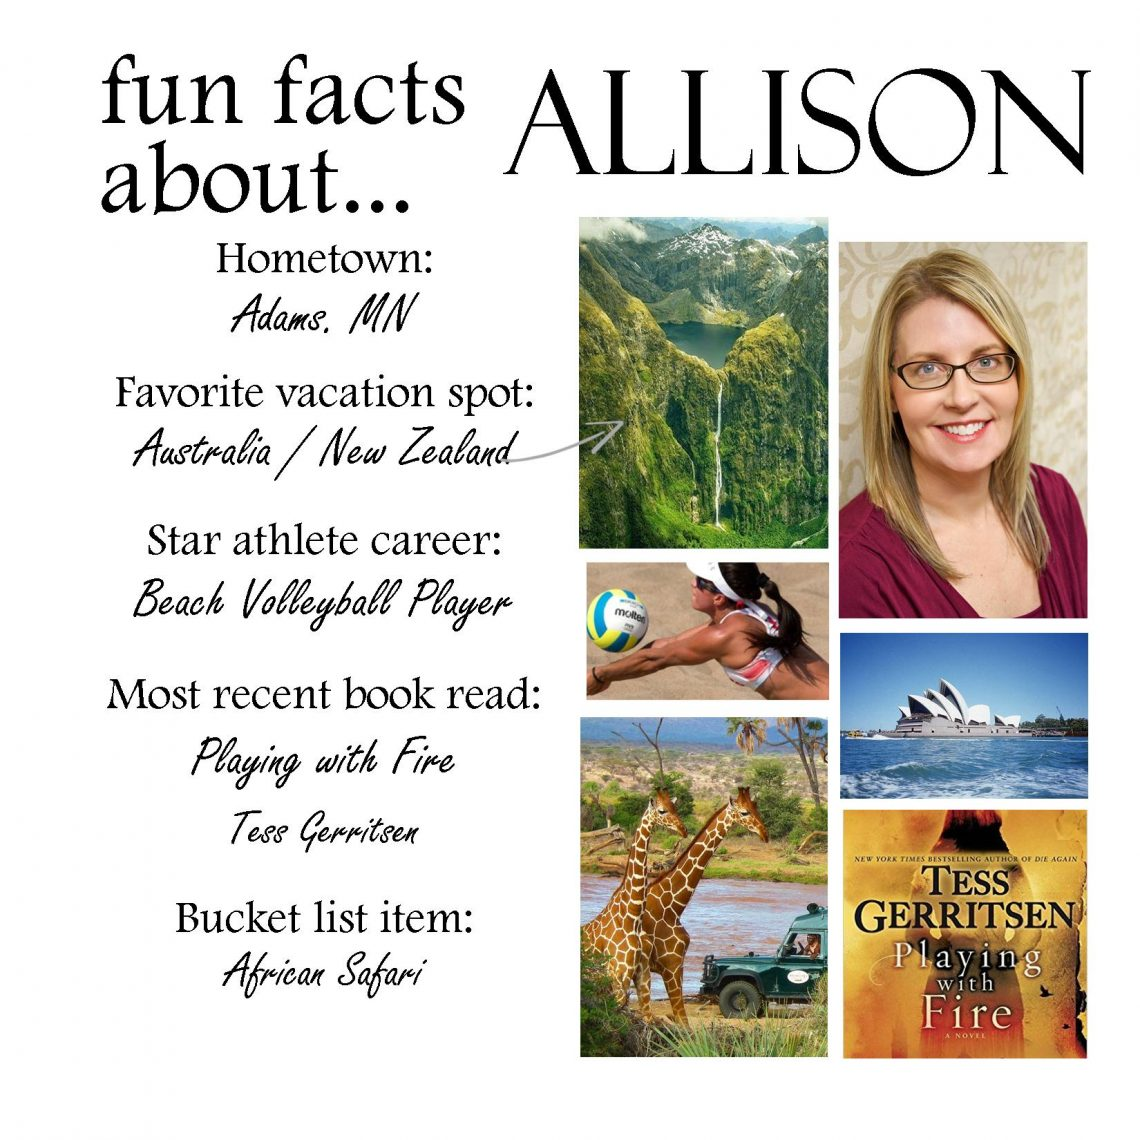 allison-fun-fact